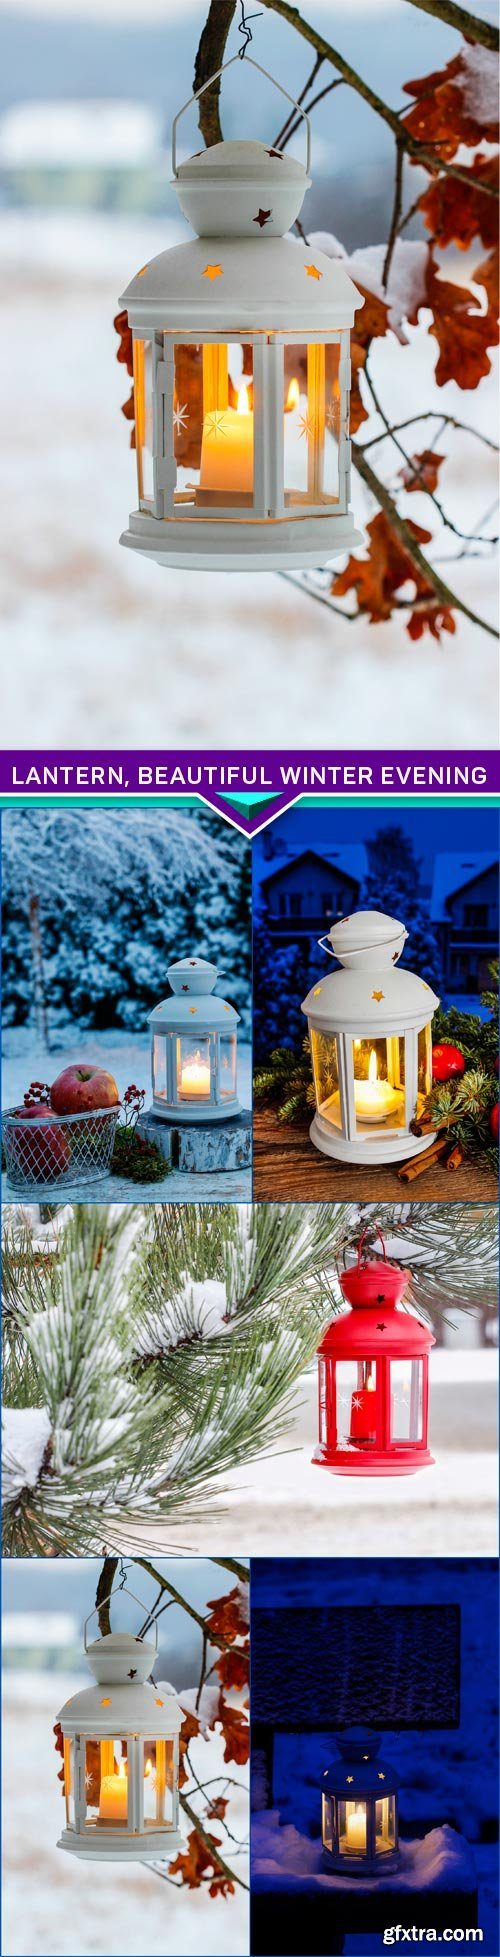 lantern, beautiful winter evening 5X JPEG